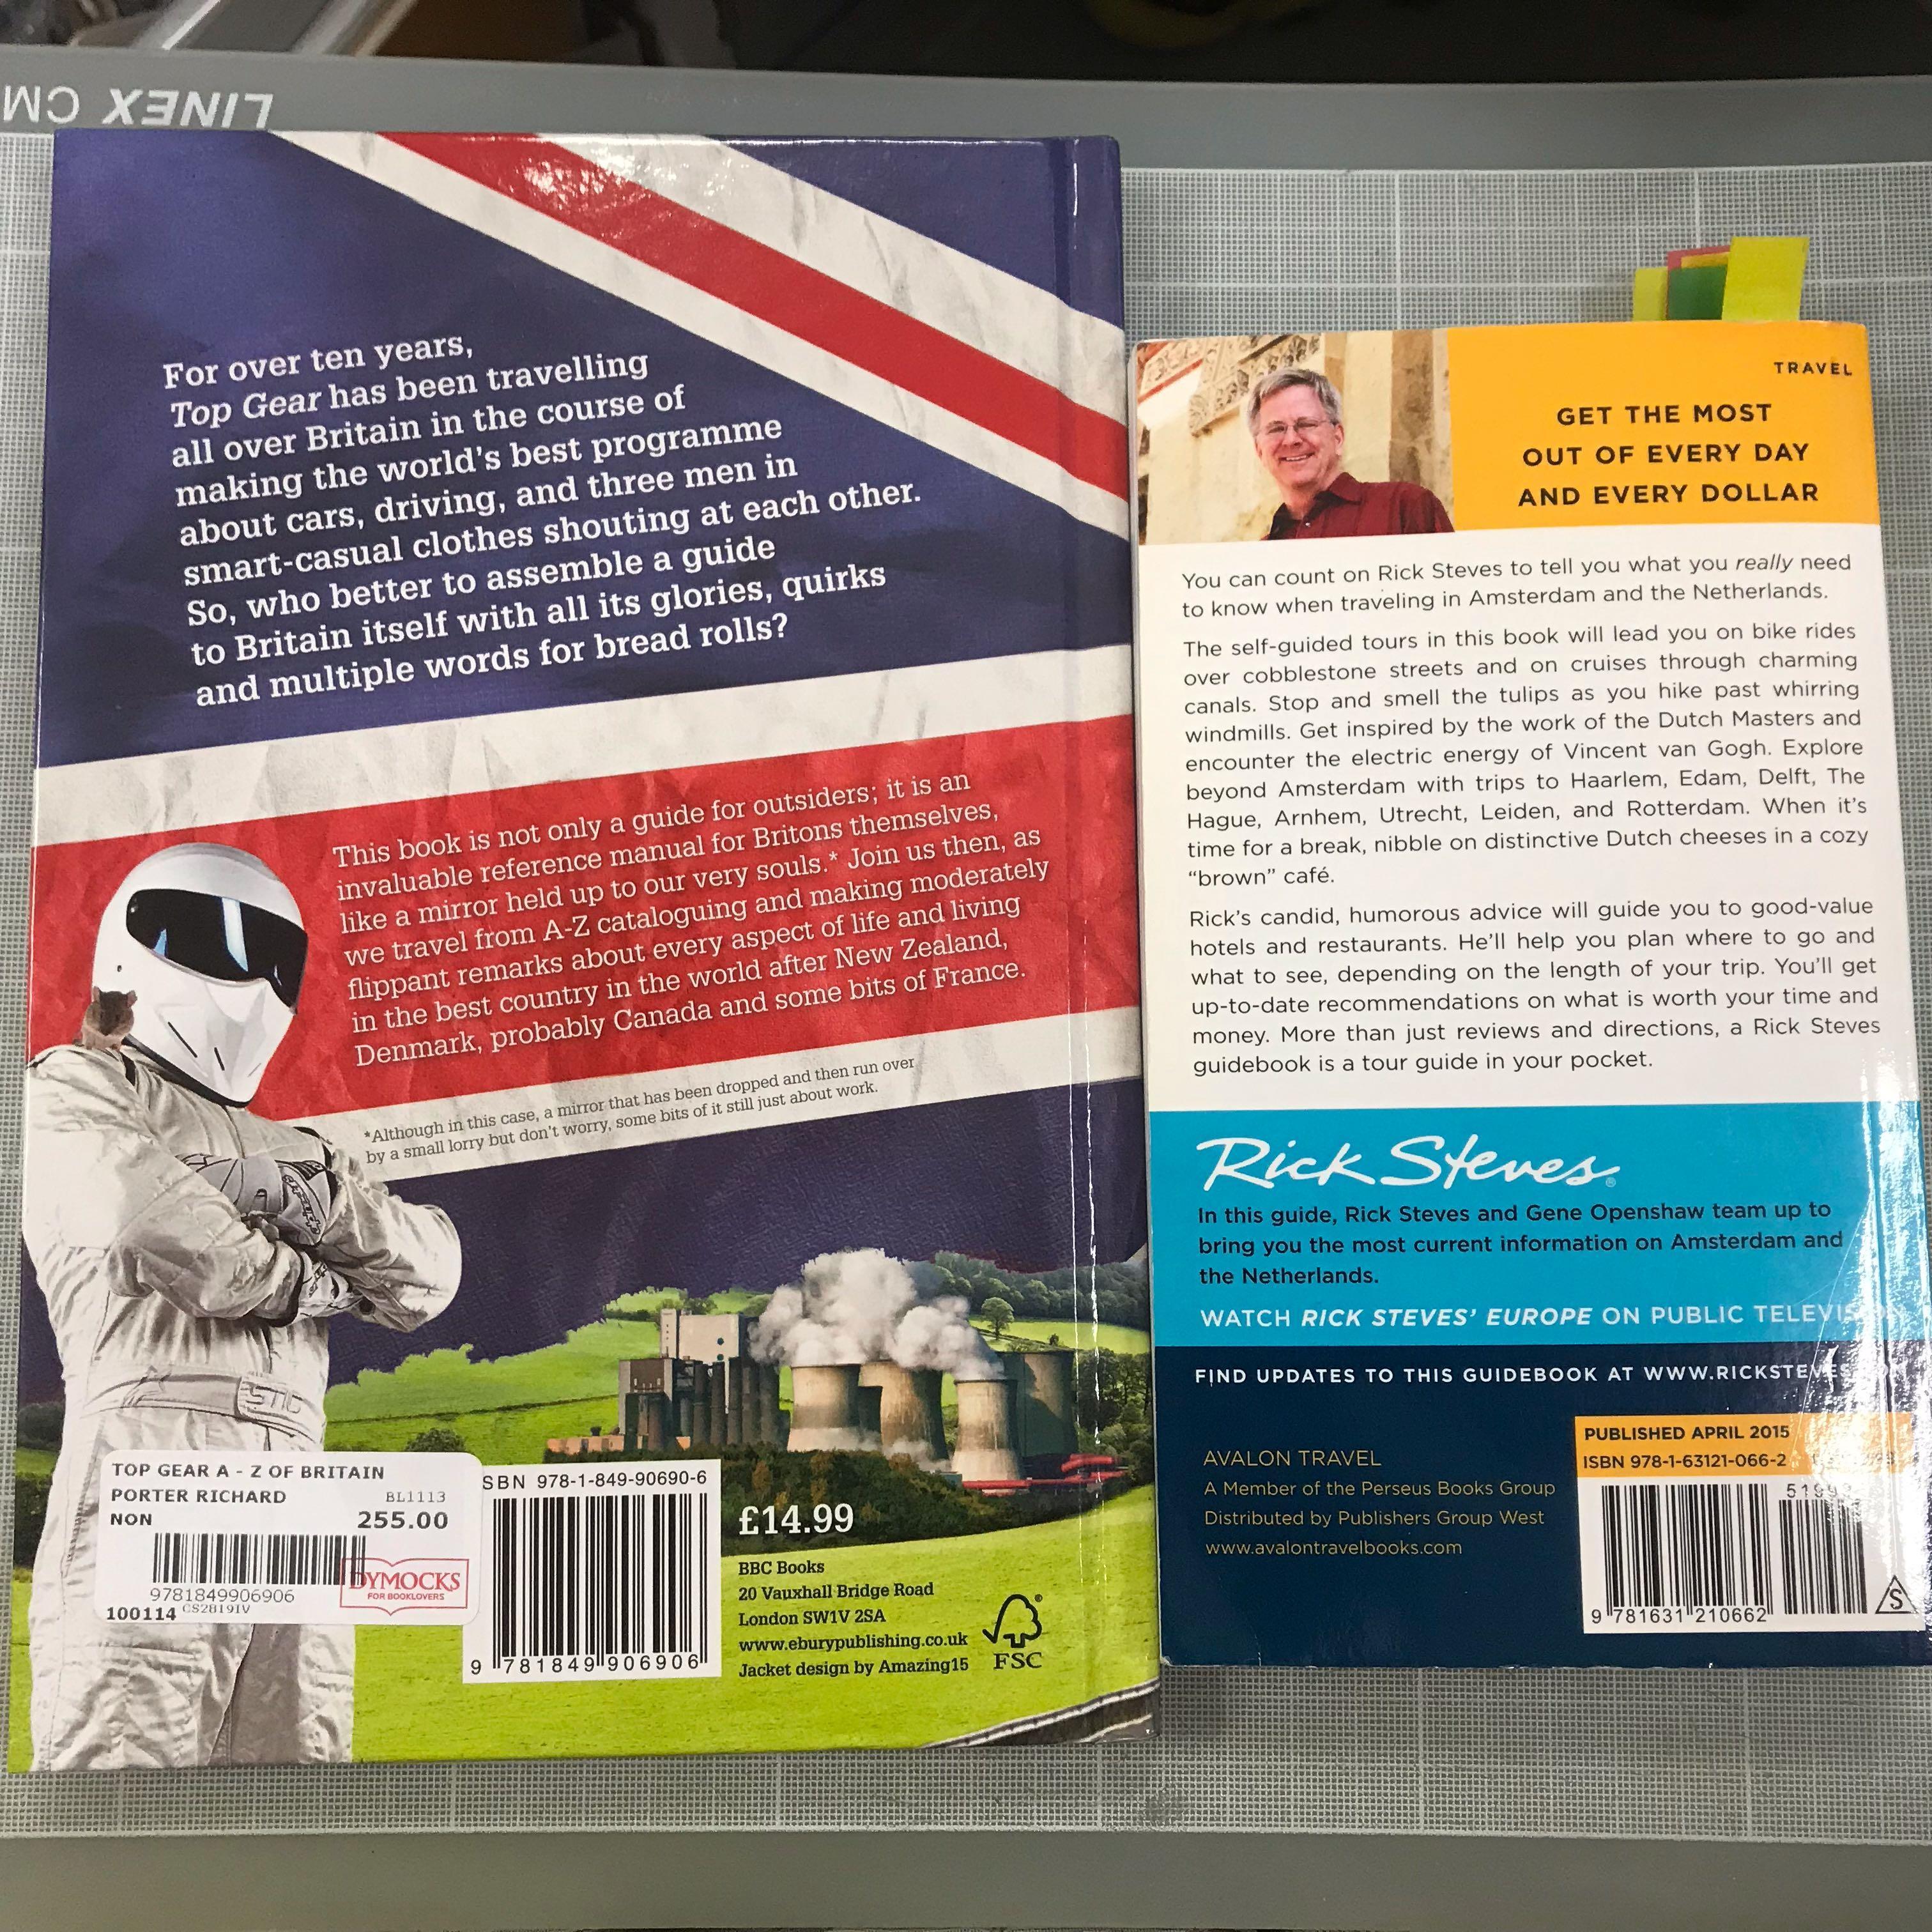 Like New Travel Books - Britain & The Netherlands 英國和荷蘭旅遊書